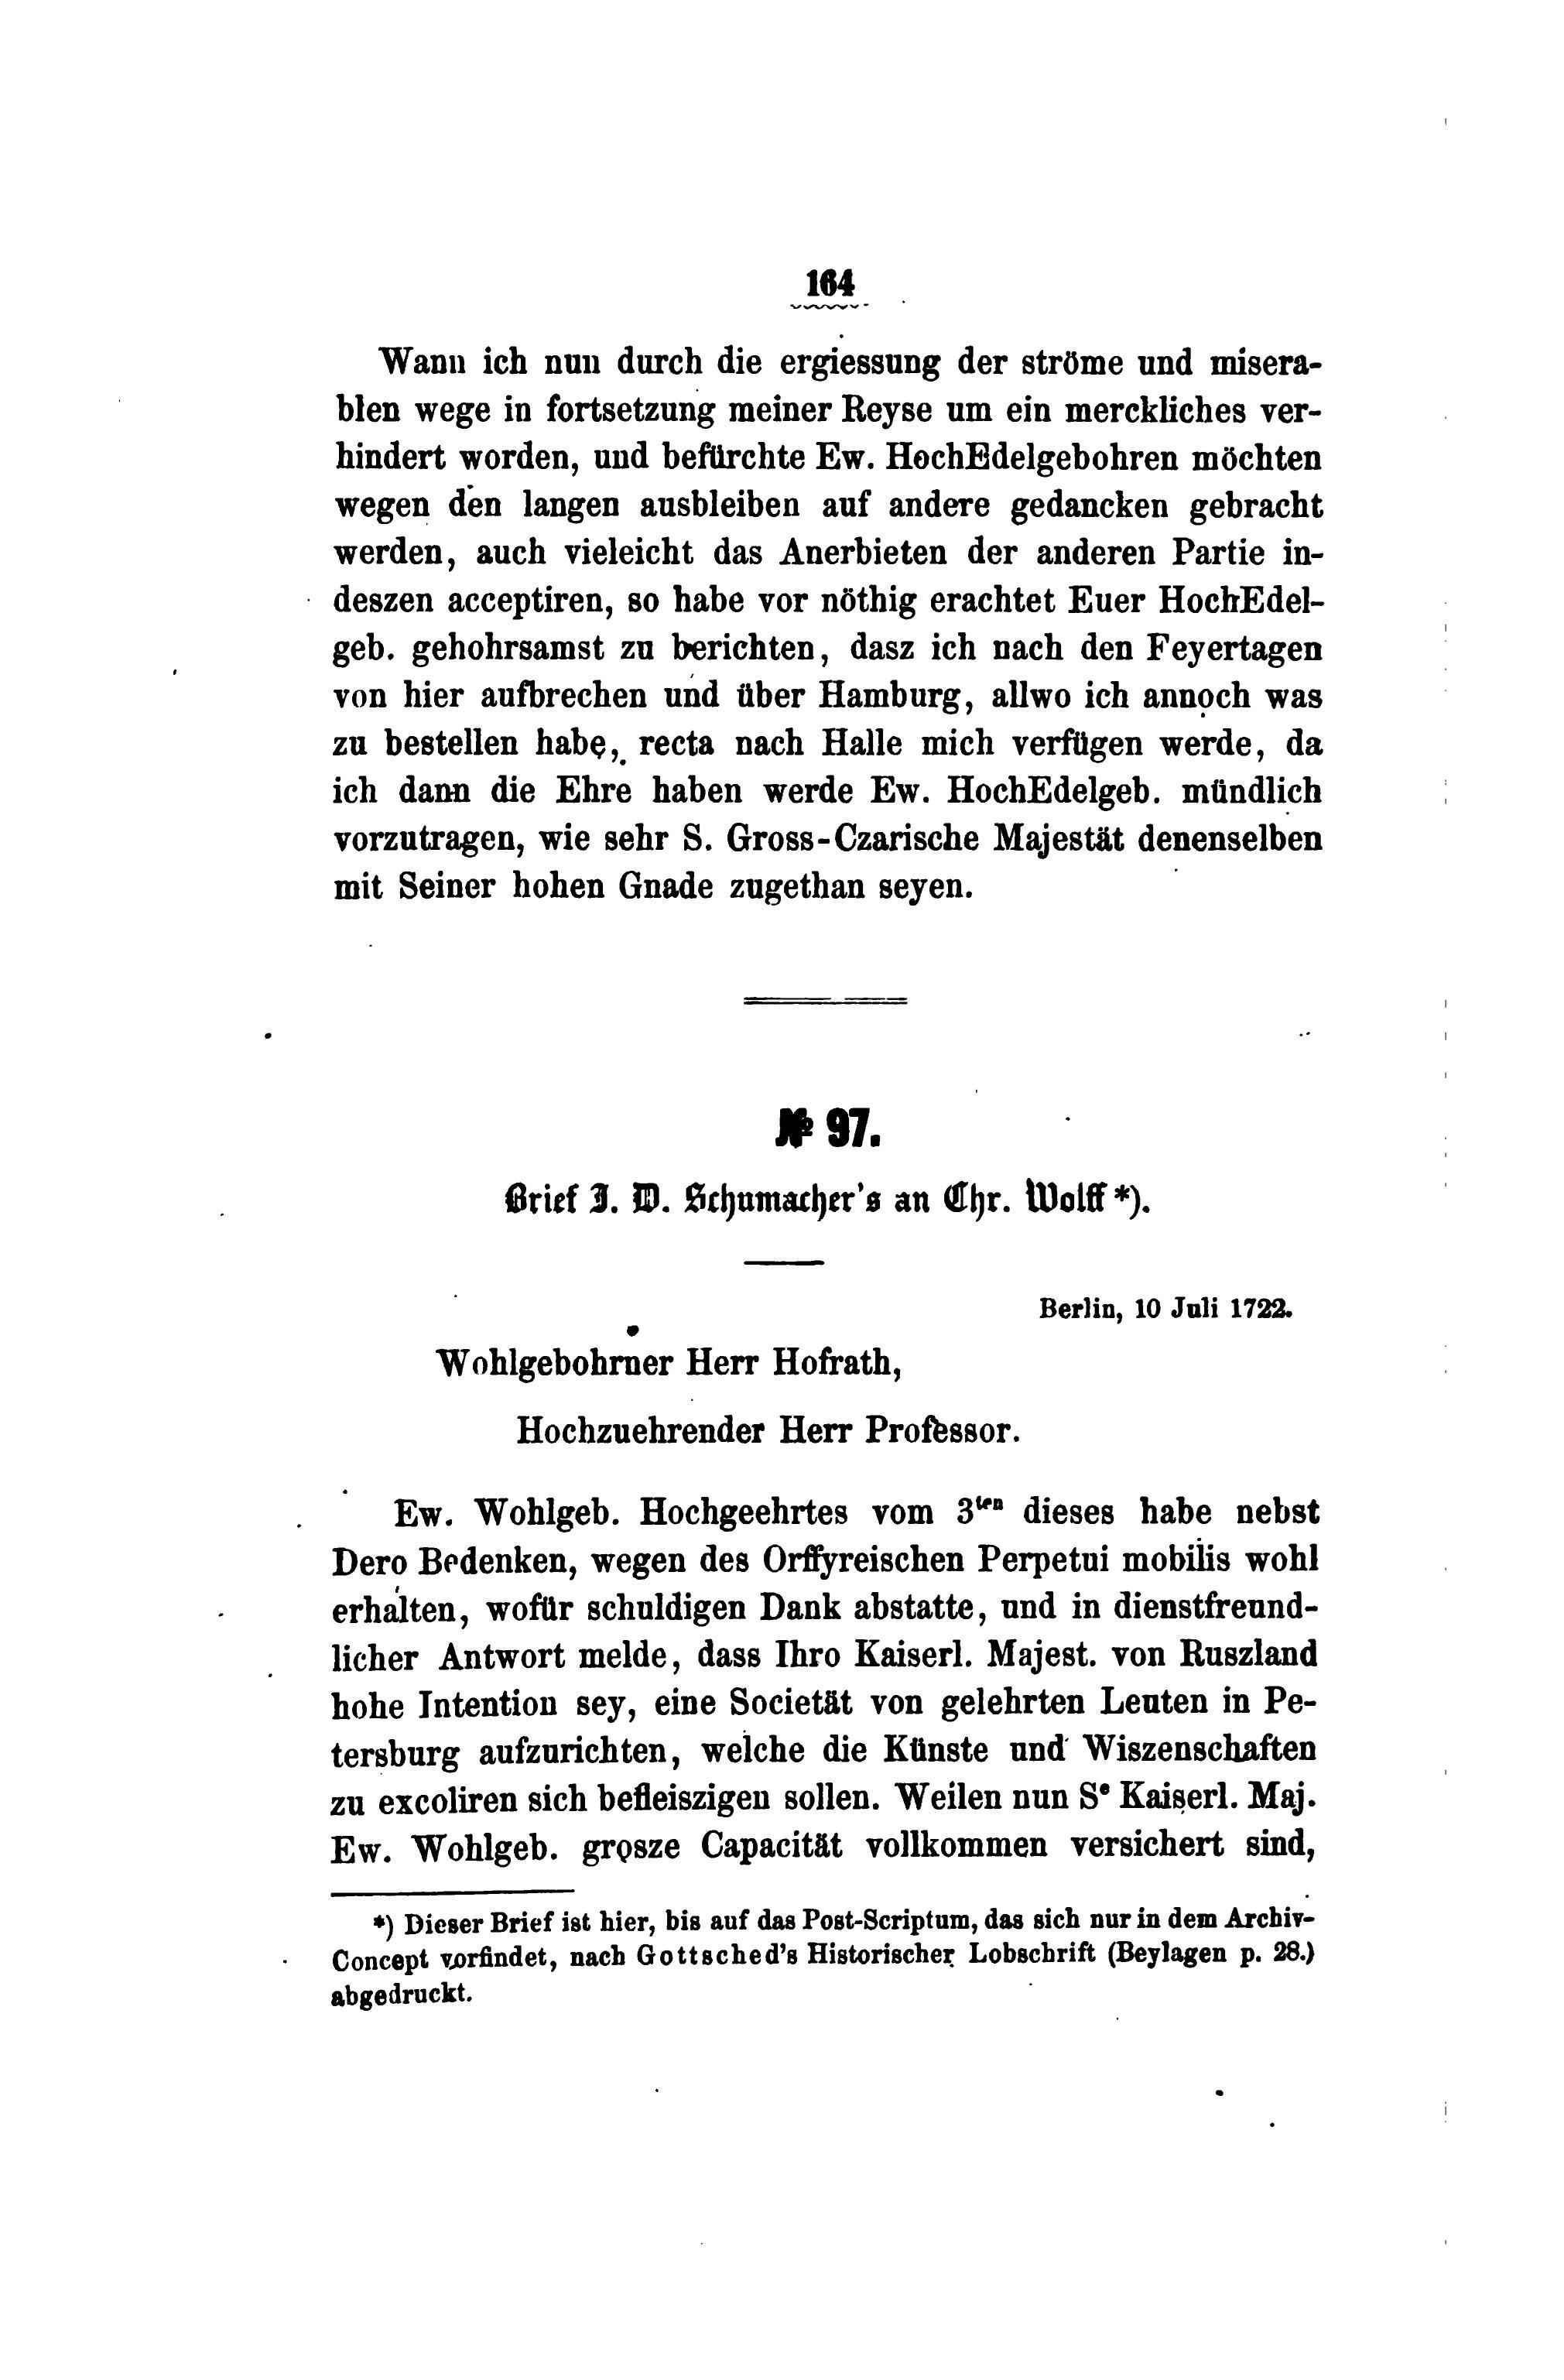 File:De Briefe Wolff 206.jpg - Wikimedia Commons